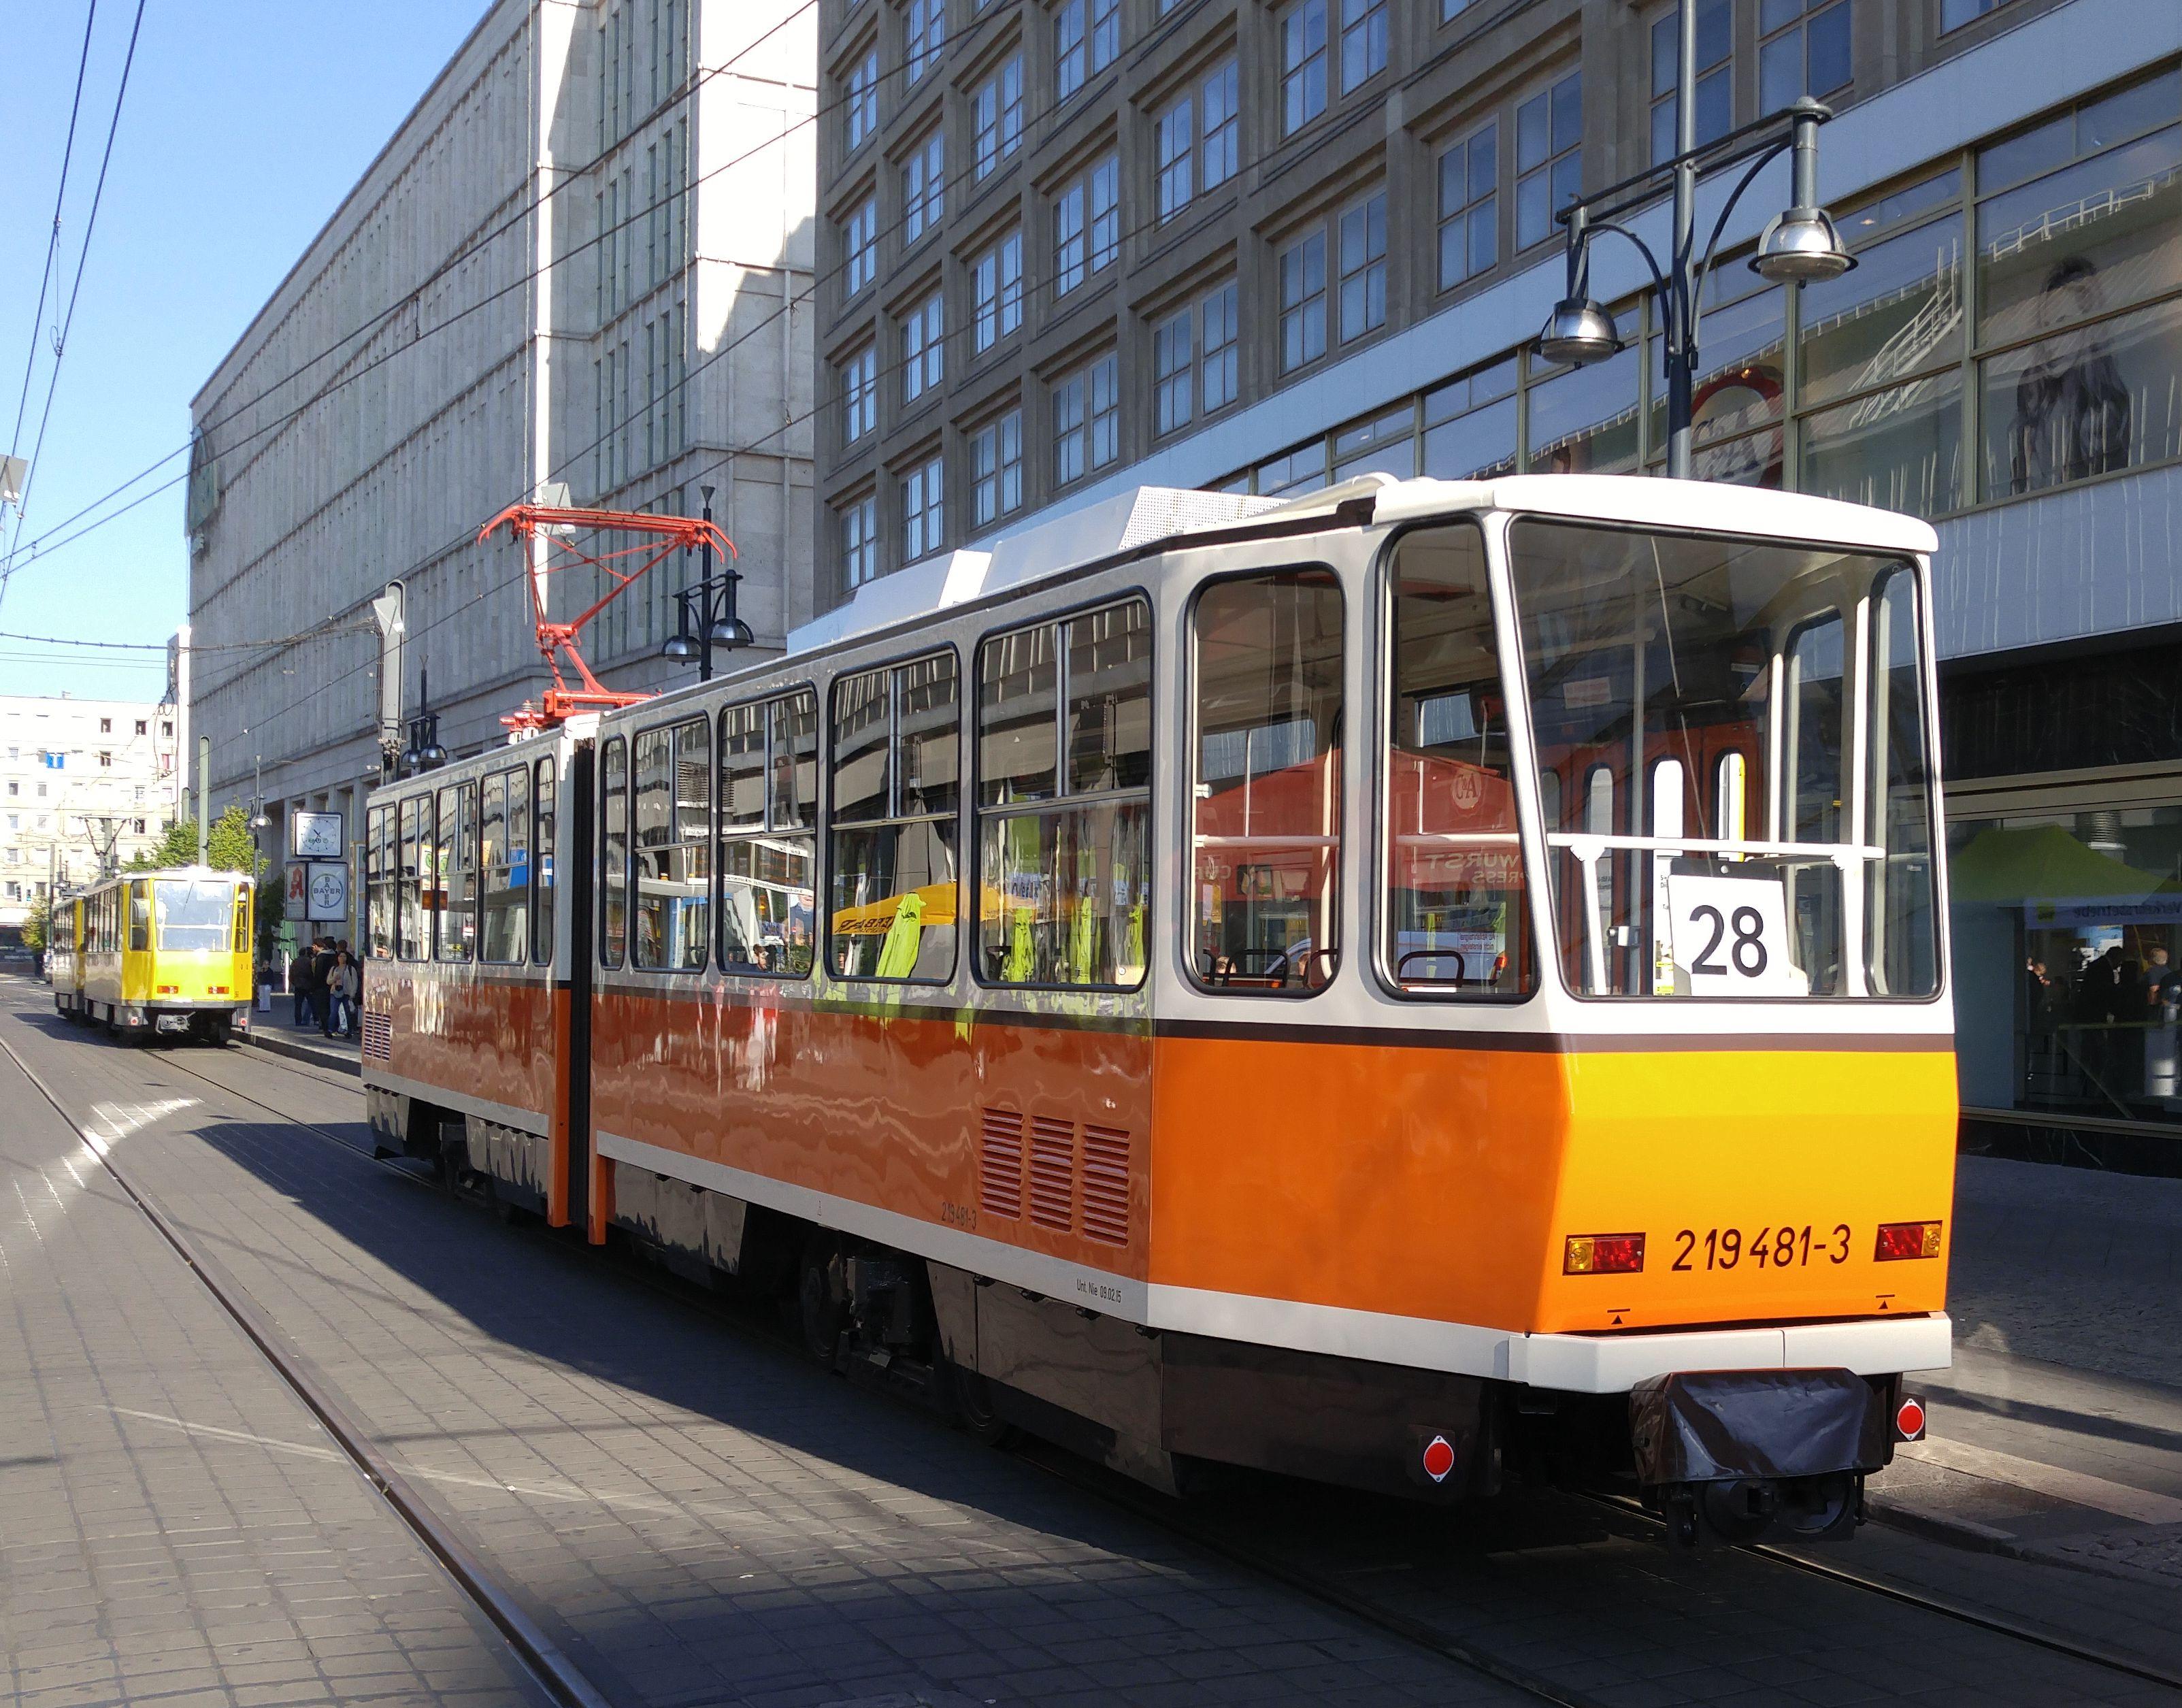 Foto: Straßenbahn 219 481, Typ Tatra KT4D, Alexanderplatz, 2016